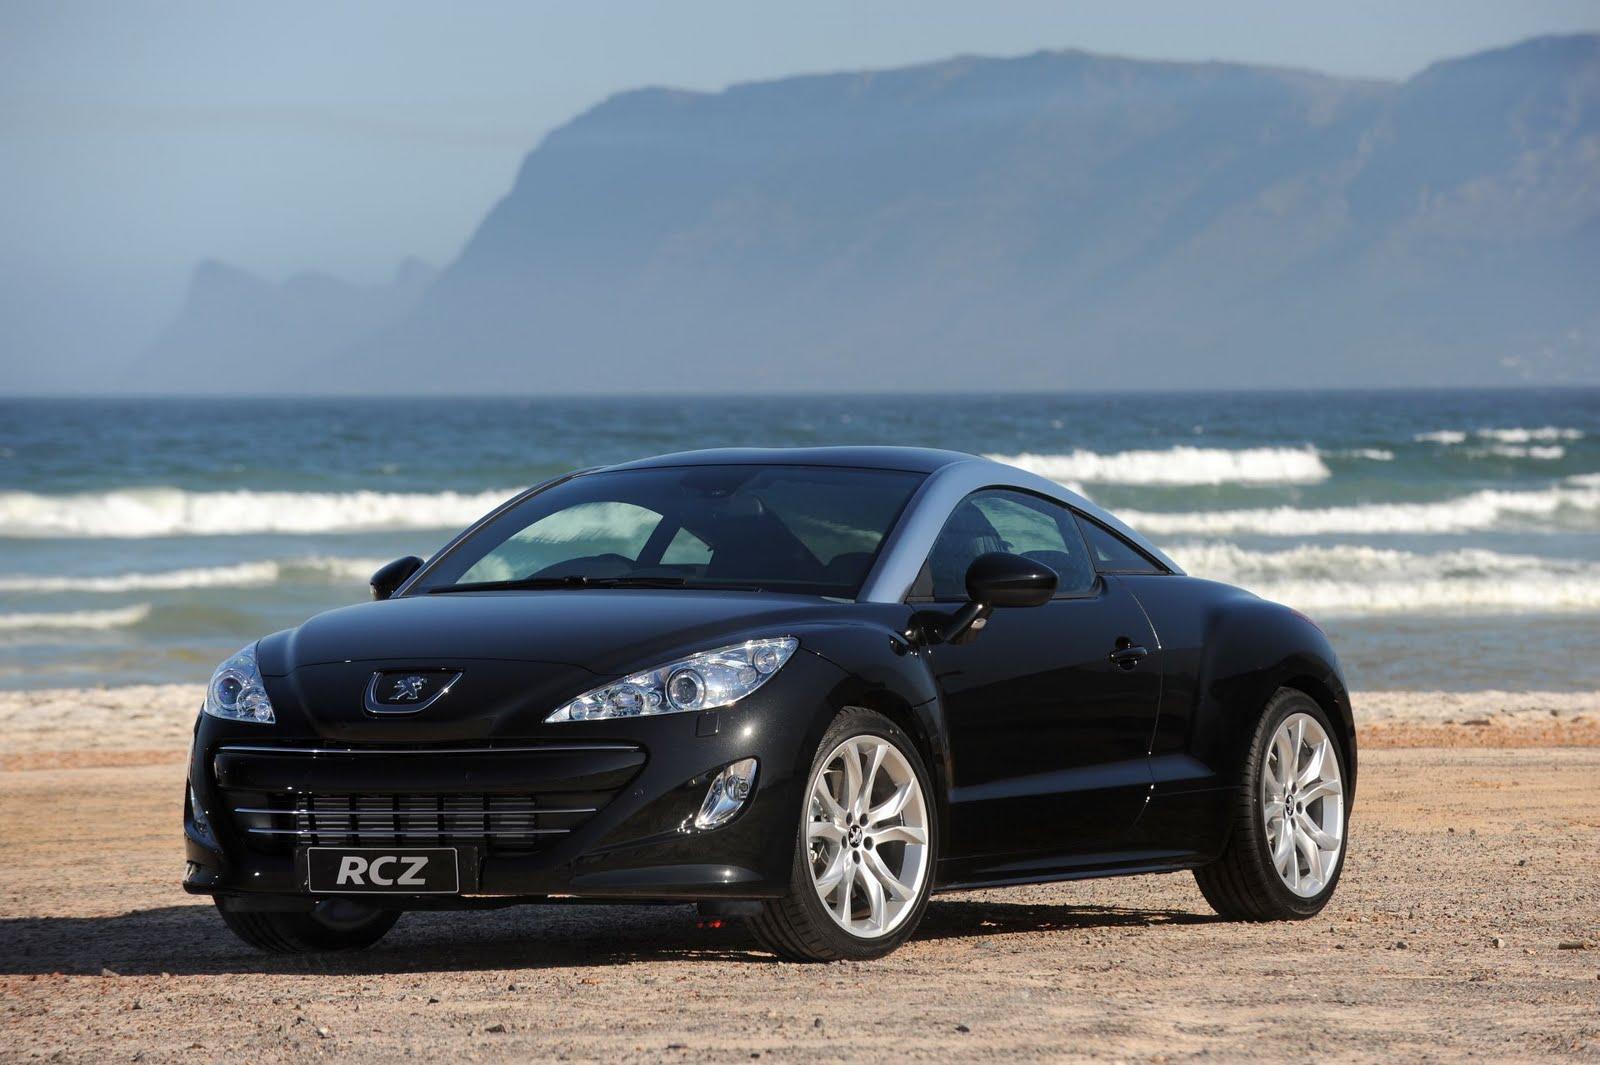 http://1.bp.blogspot.com/_MSM9eFk9HH8/TJdEIQZqBYI/AAAAAAAAGf0/uOuOeeeeegs/s1600/Peugeot%20RCZ%201.jpg